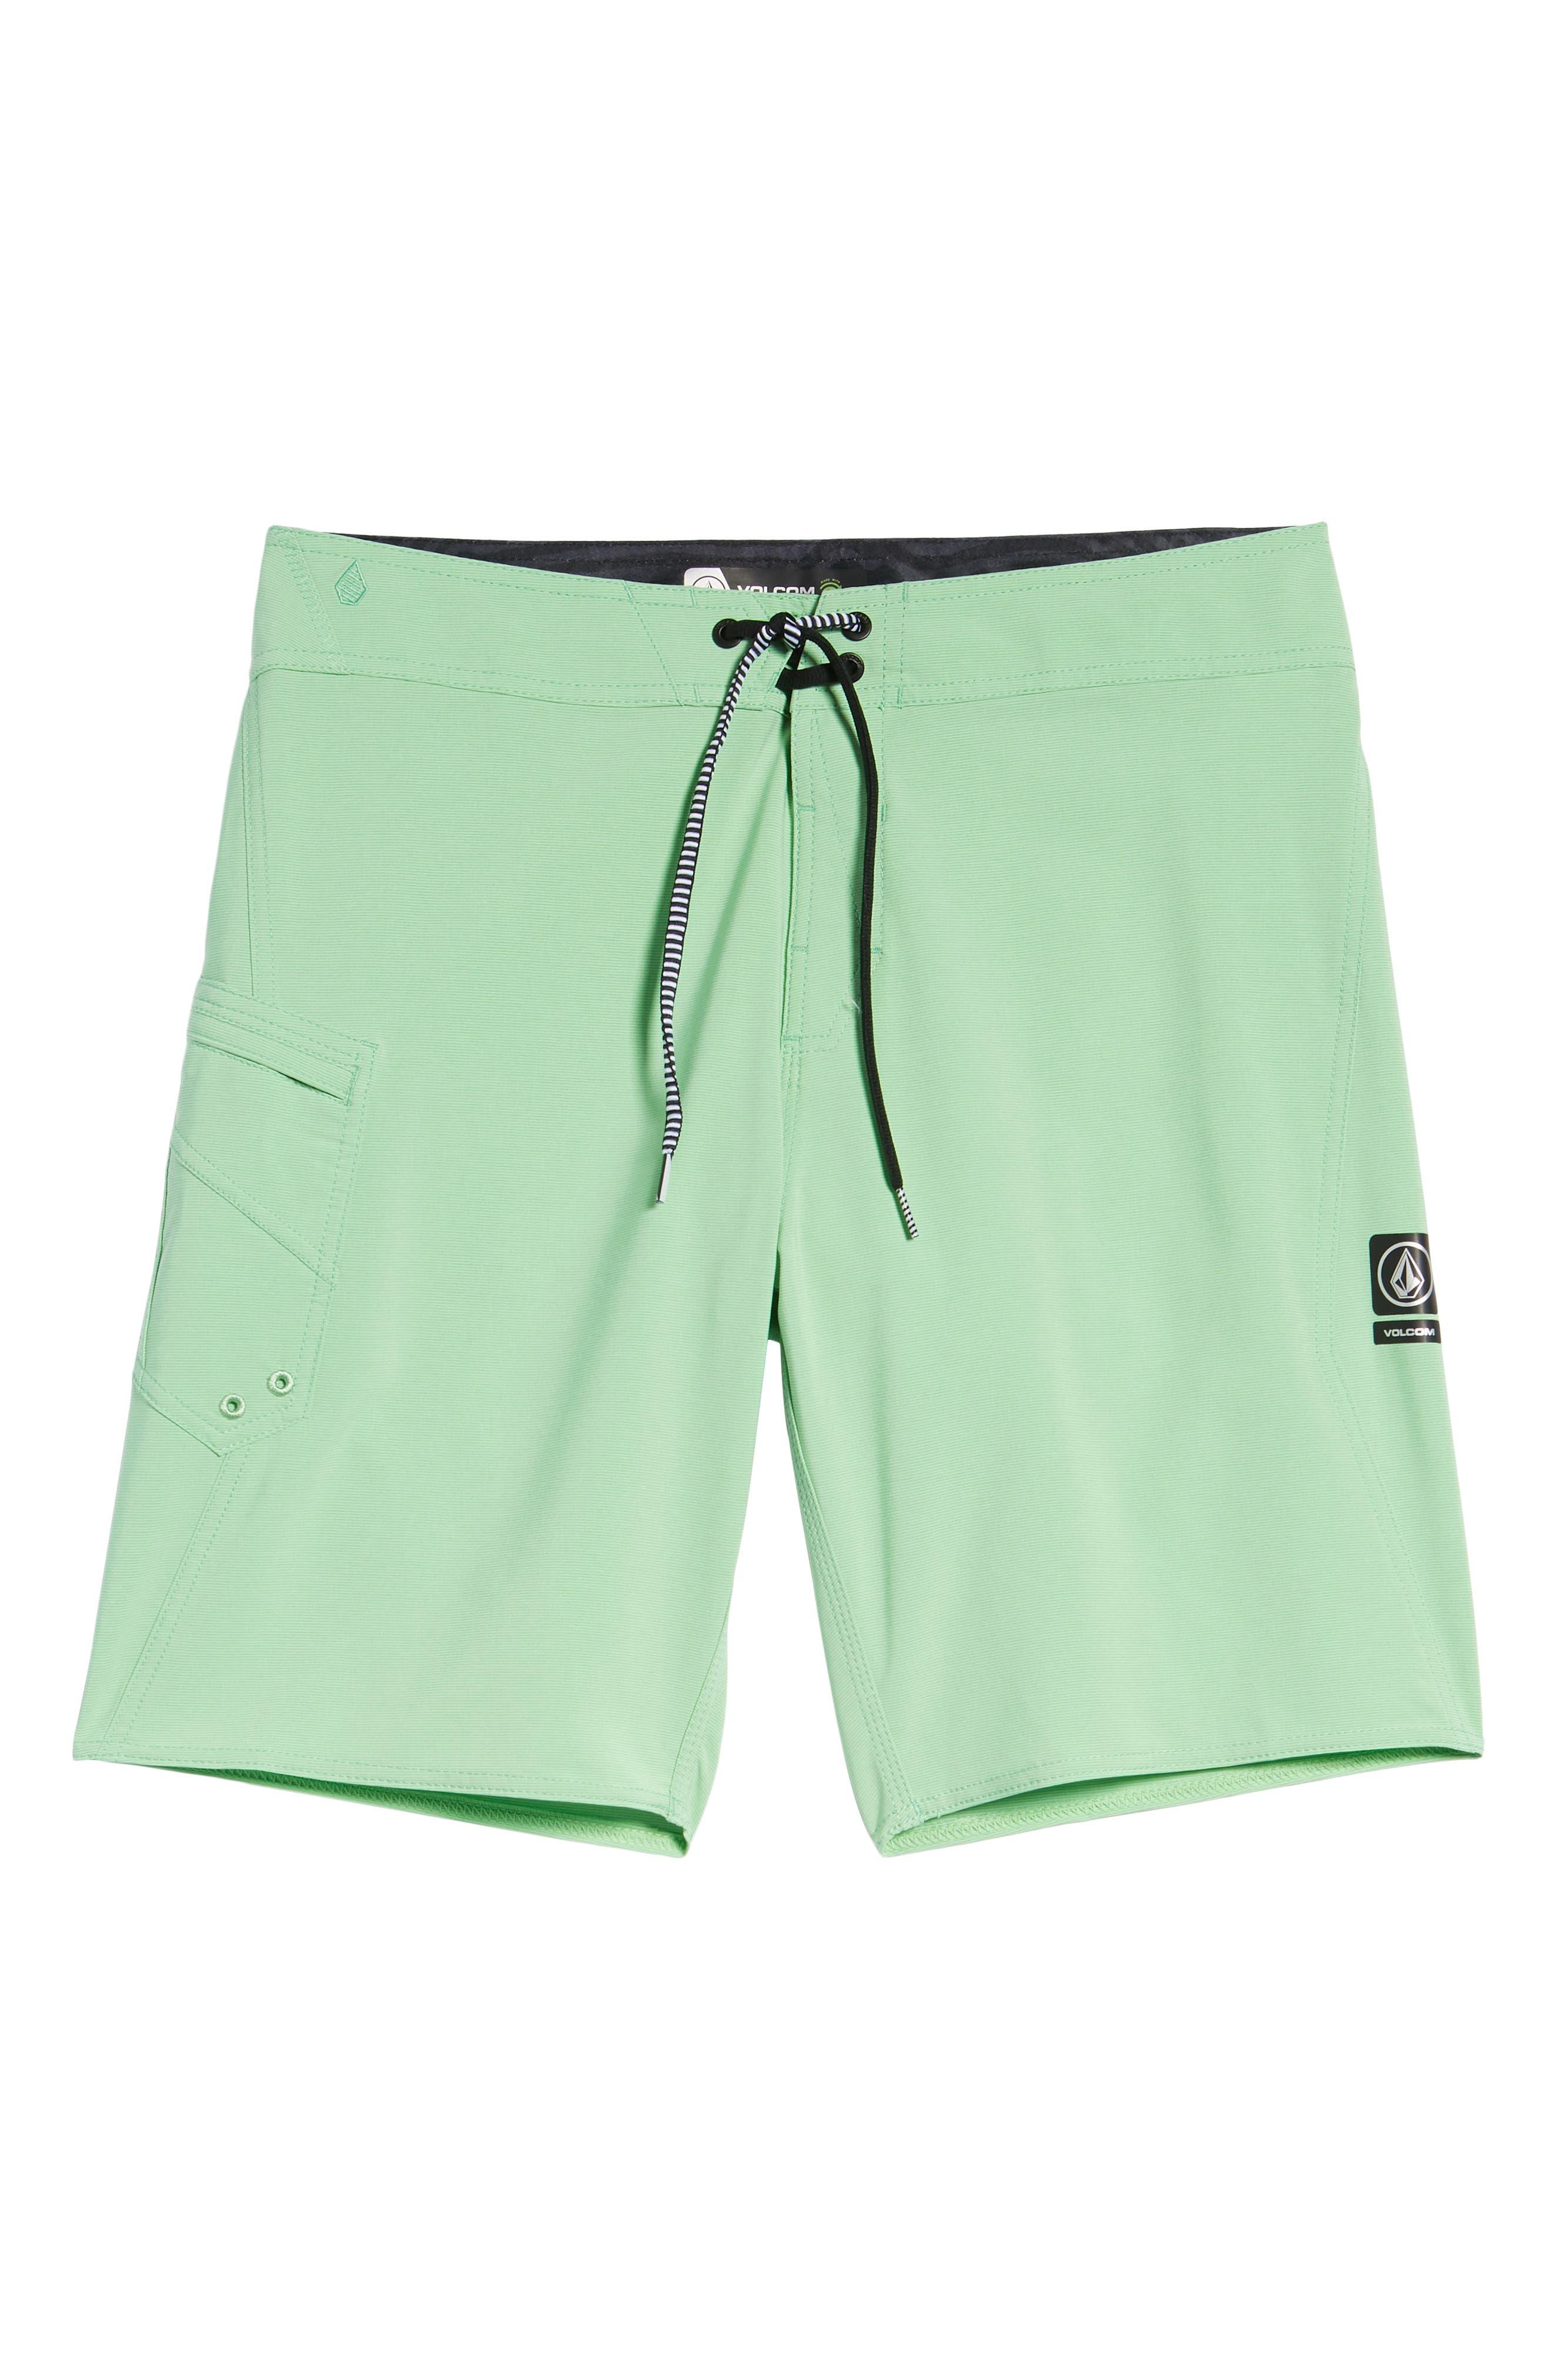 Lido Mod Board Shorts,                             Alternate thumbnail 6, color,                             POISON GREEN